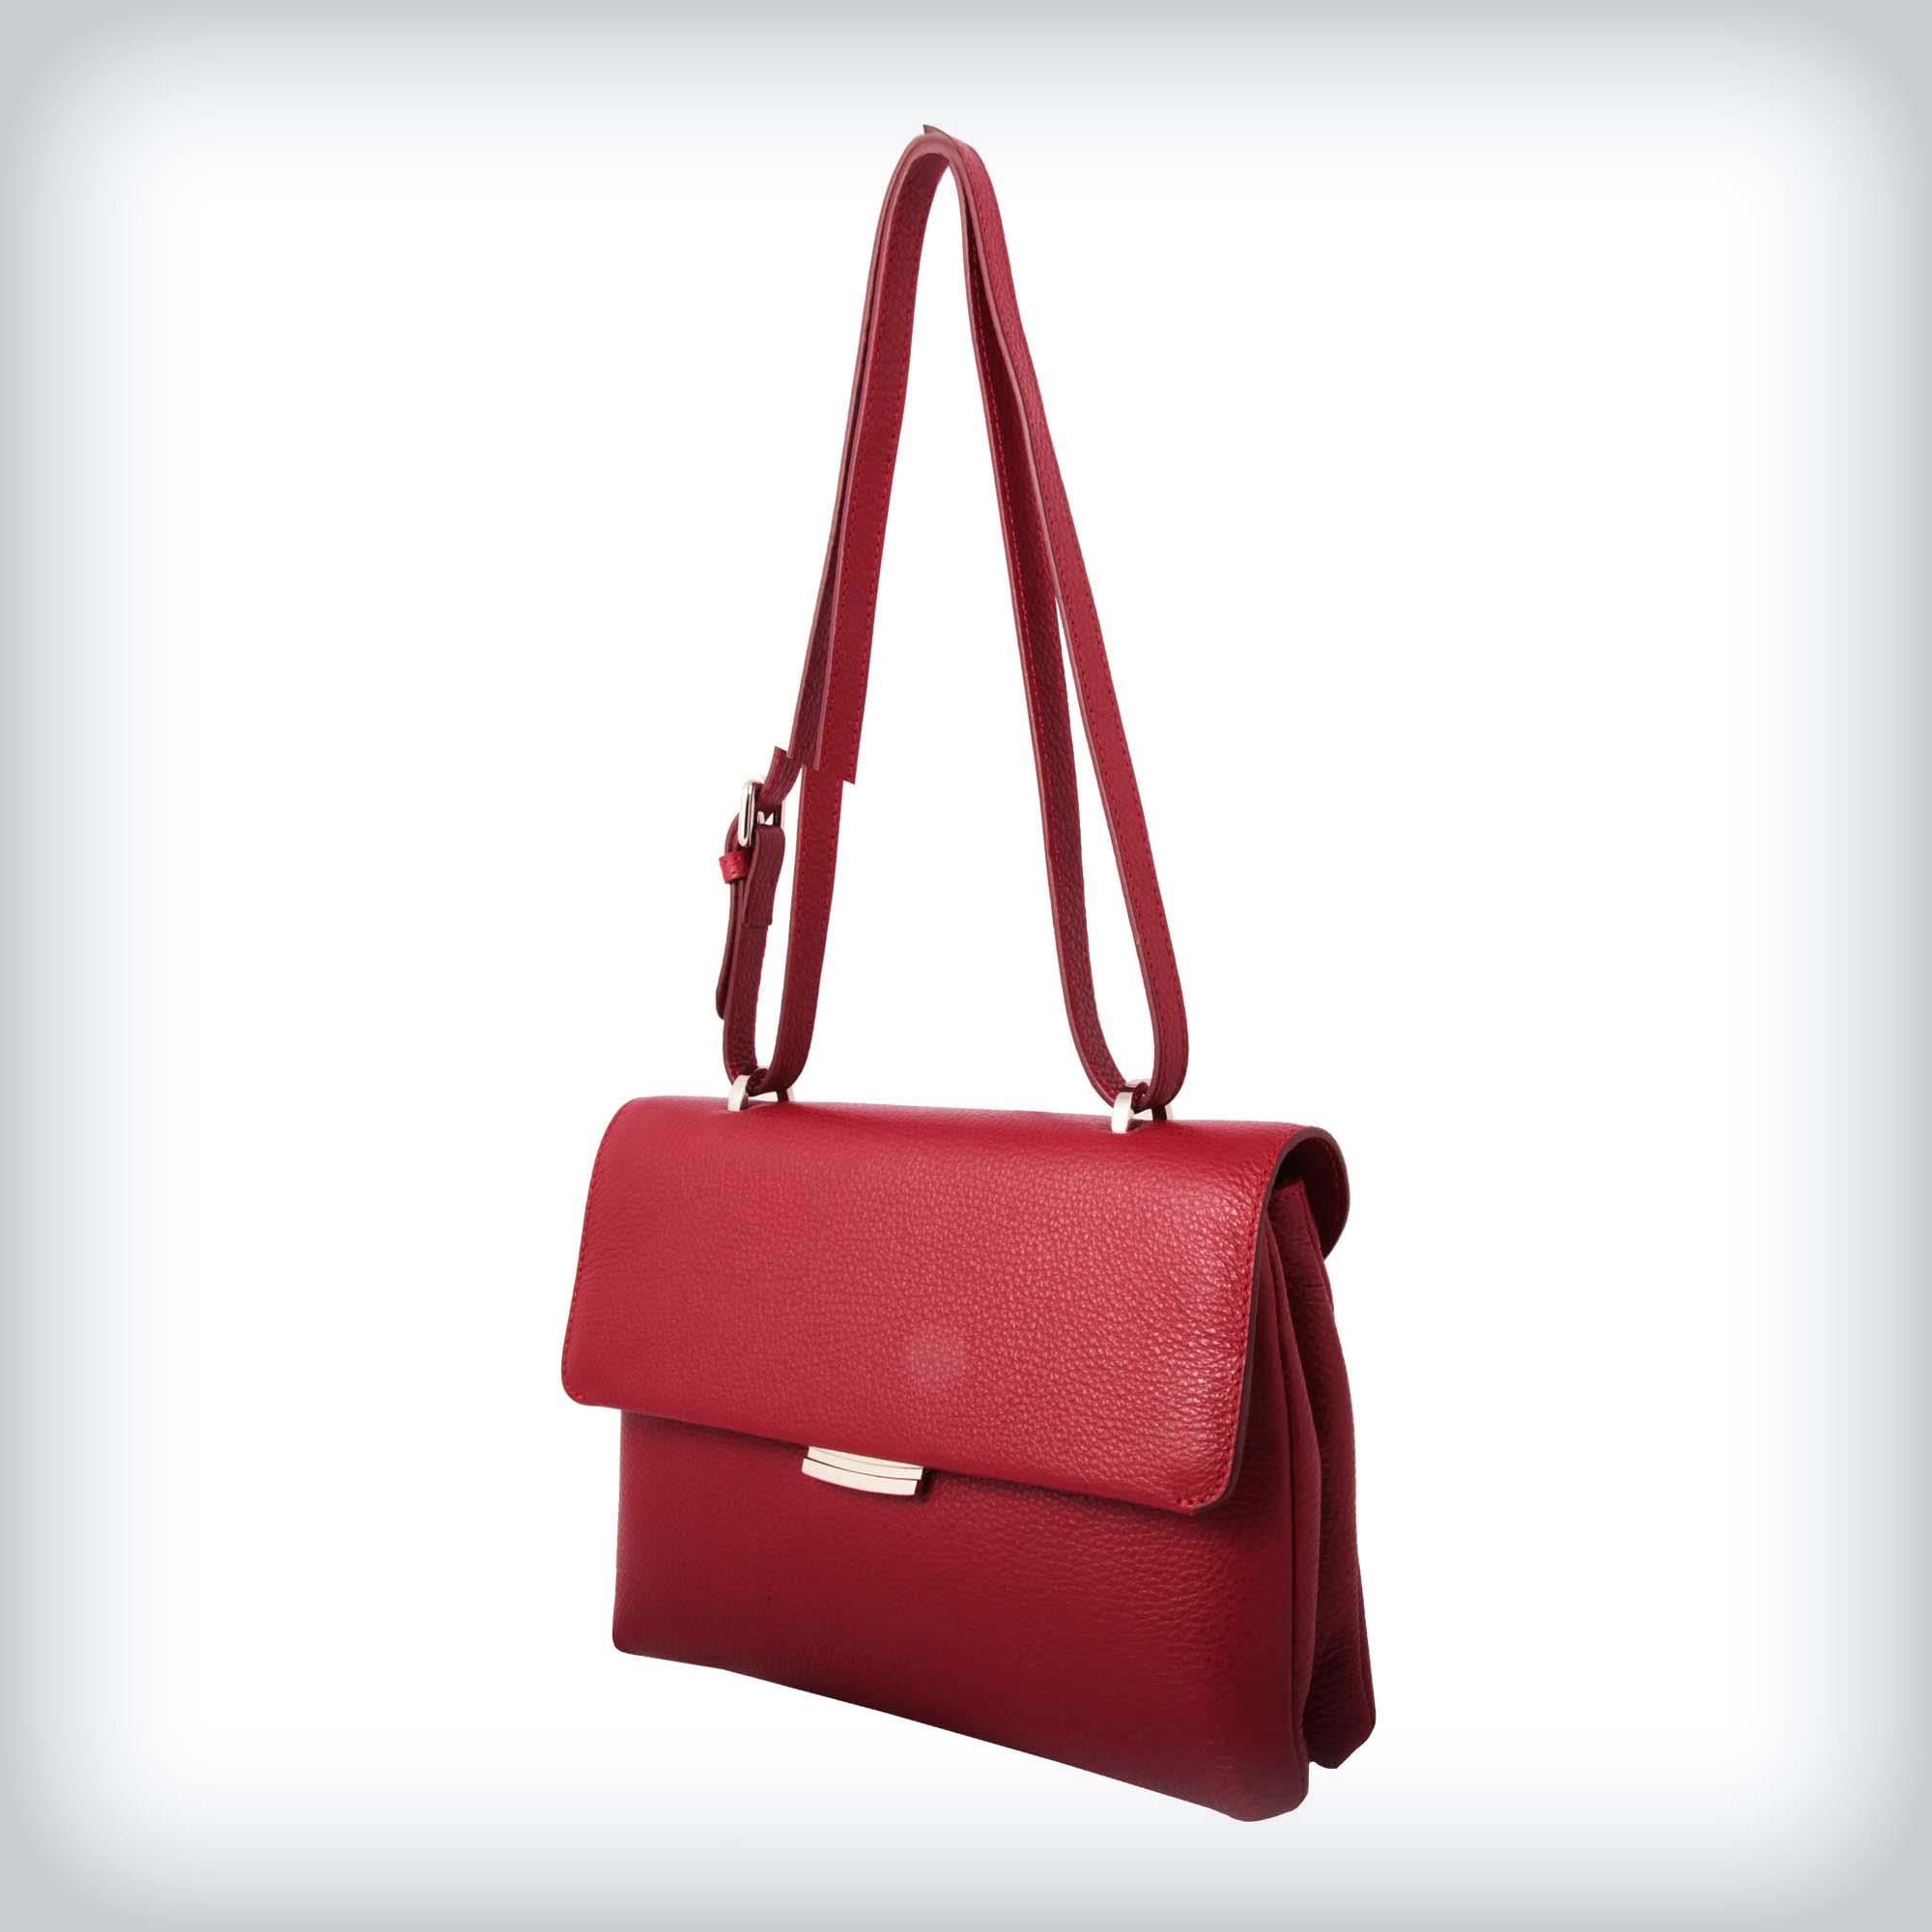 25ec21aee607 ... Flap Shoulder bag Peruzzi Return to Previous Page. lightbox · lightbox